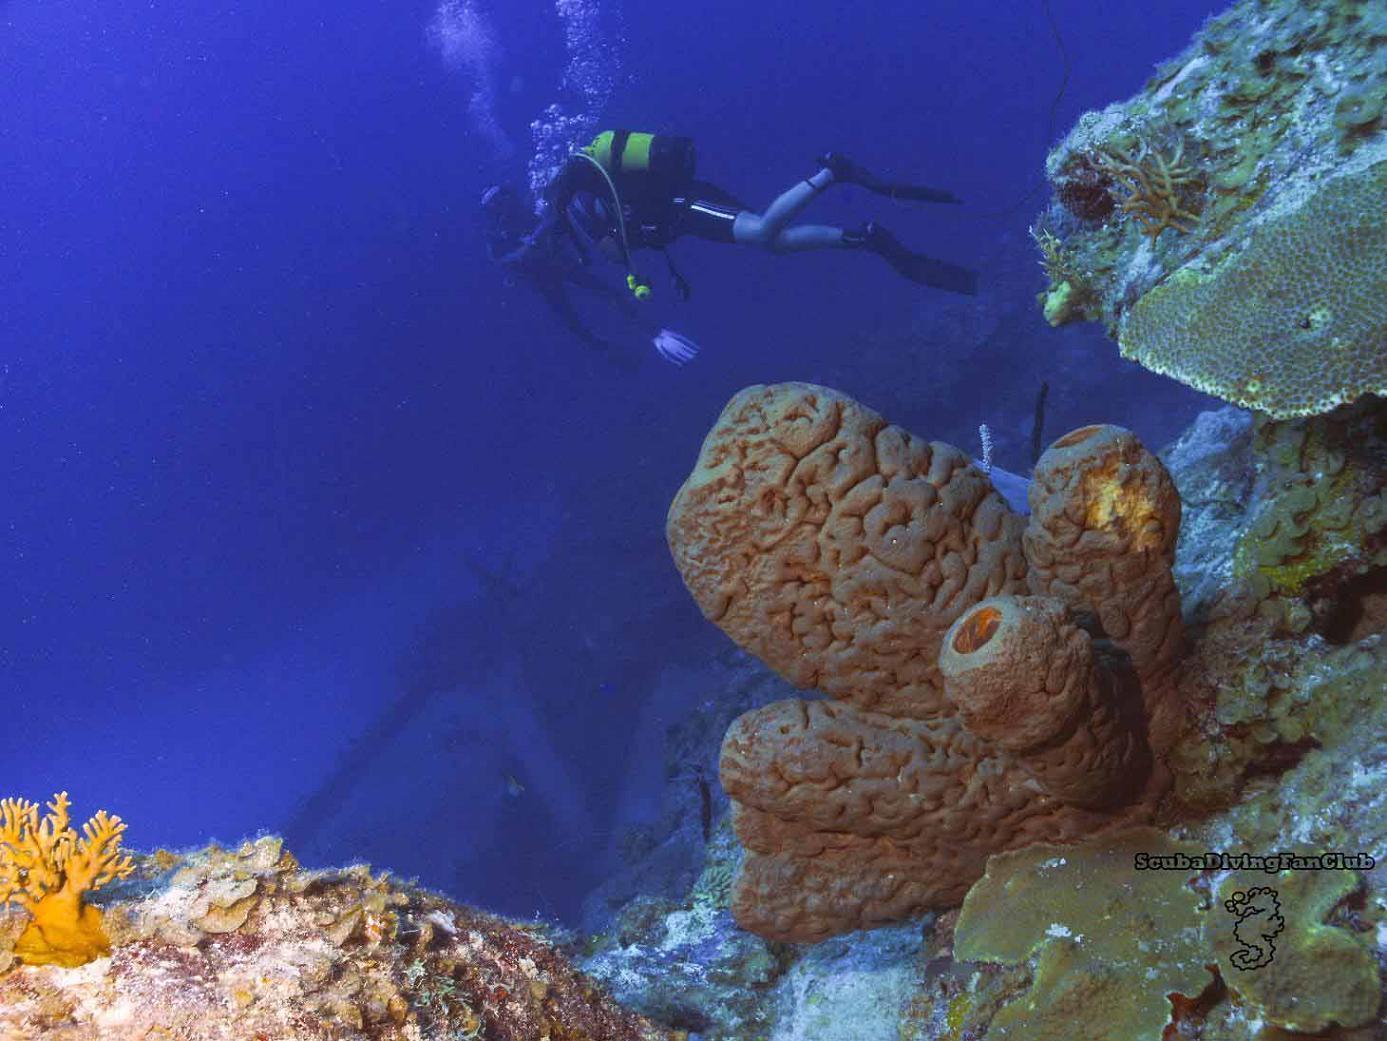 scuba diving wallpaper wallpapers - photo #21